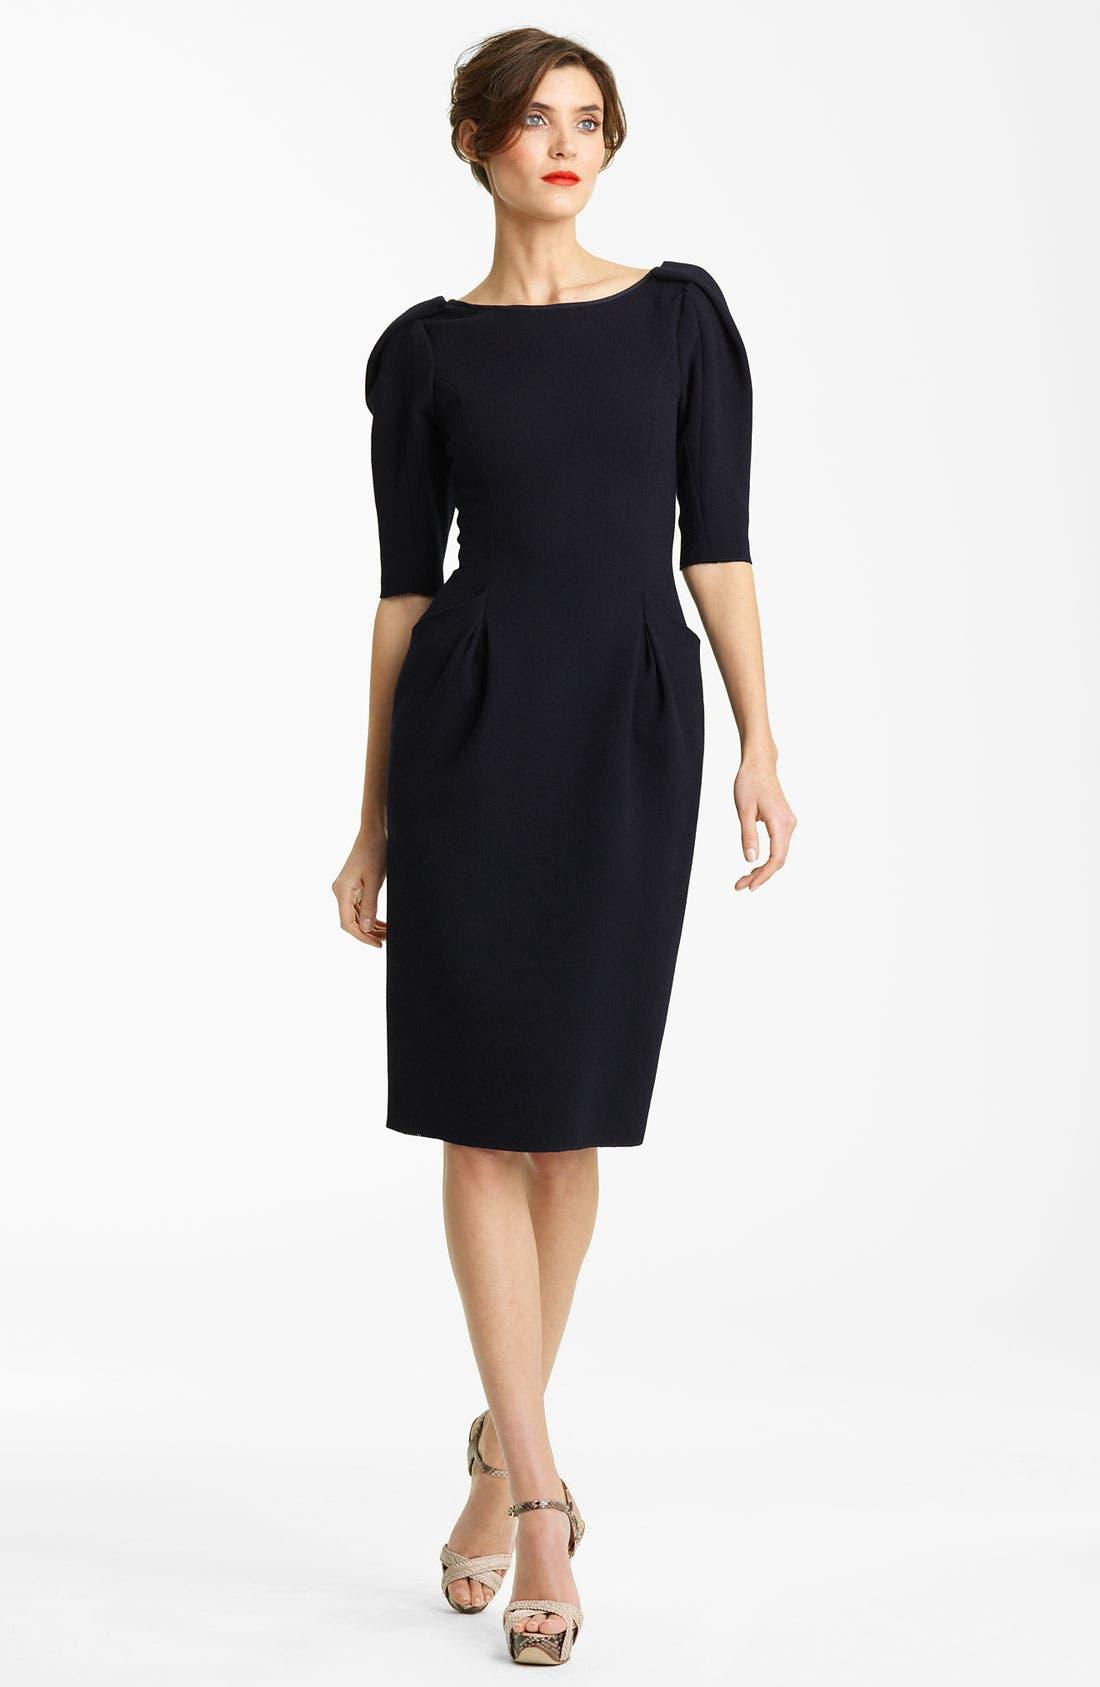 Alternate Image 1 Selected - Nina Ricci Wool Crepe Dress